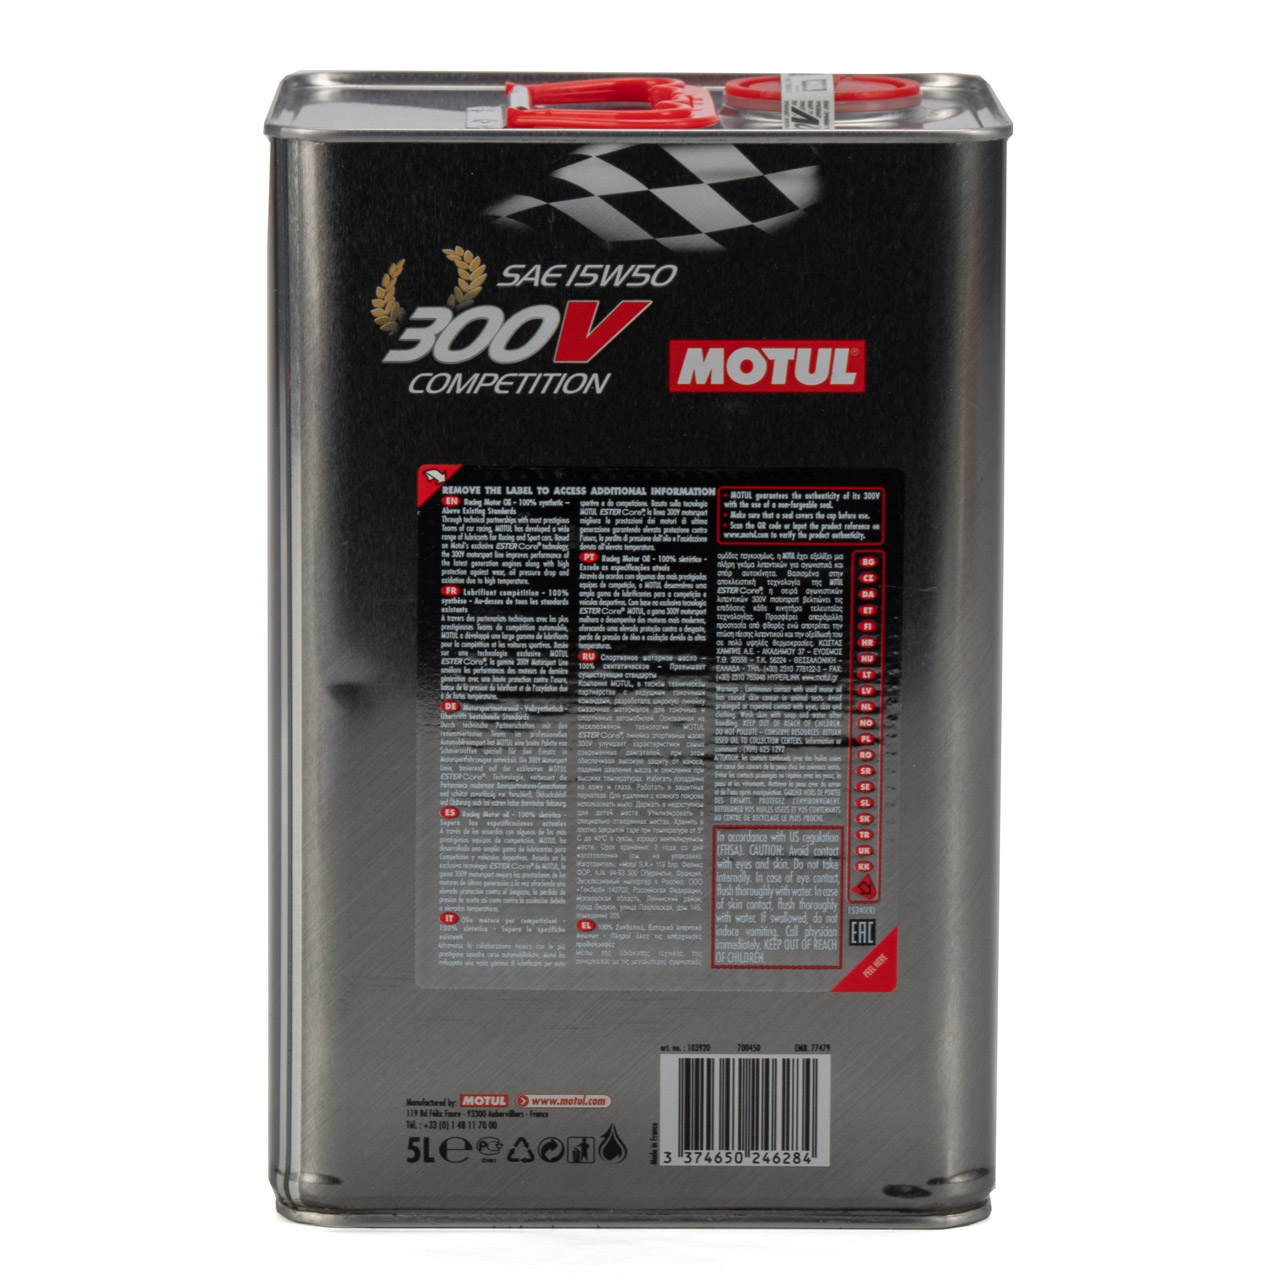 MOTUL 300 V Competition ESTER Core RACING Motoröl Öl 15W-50 15W50 - 5L 5 Liter